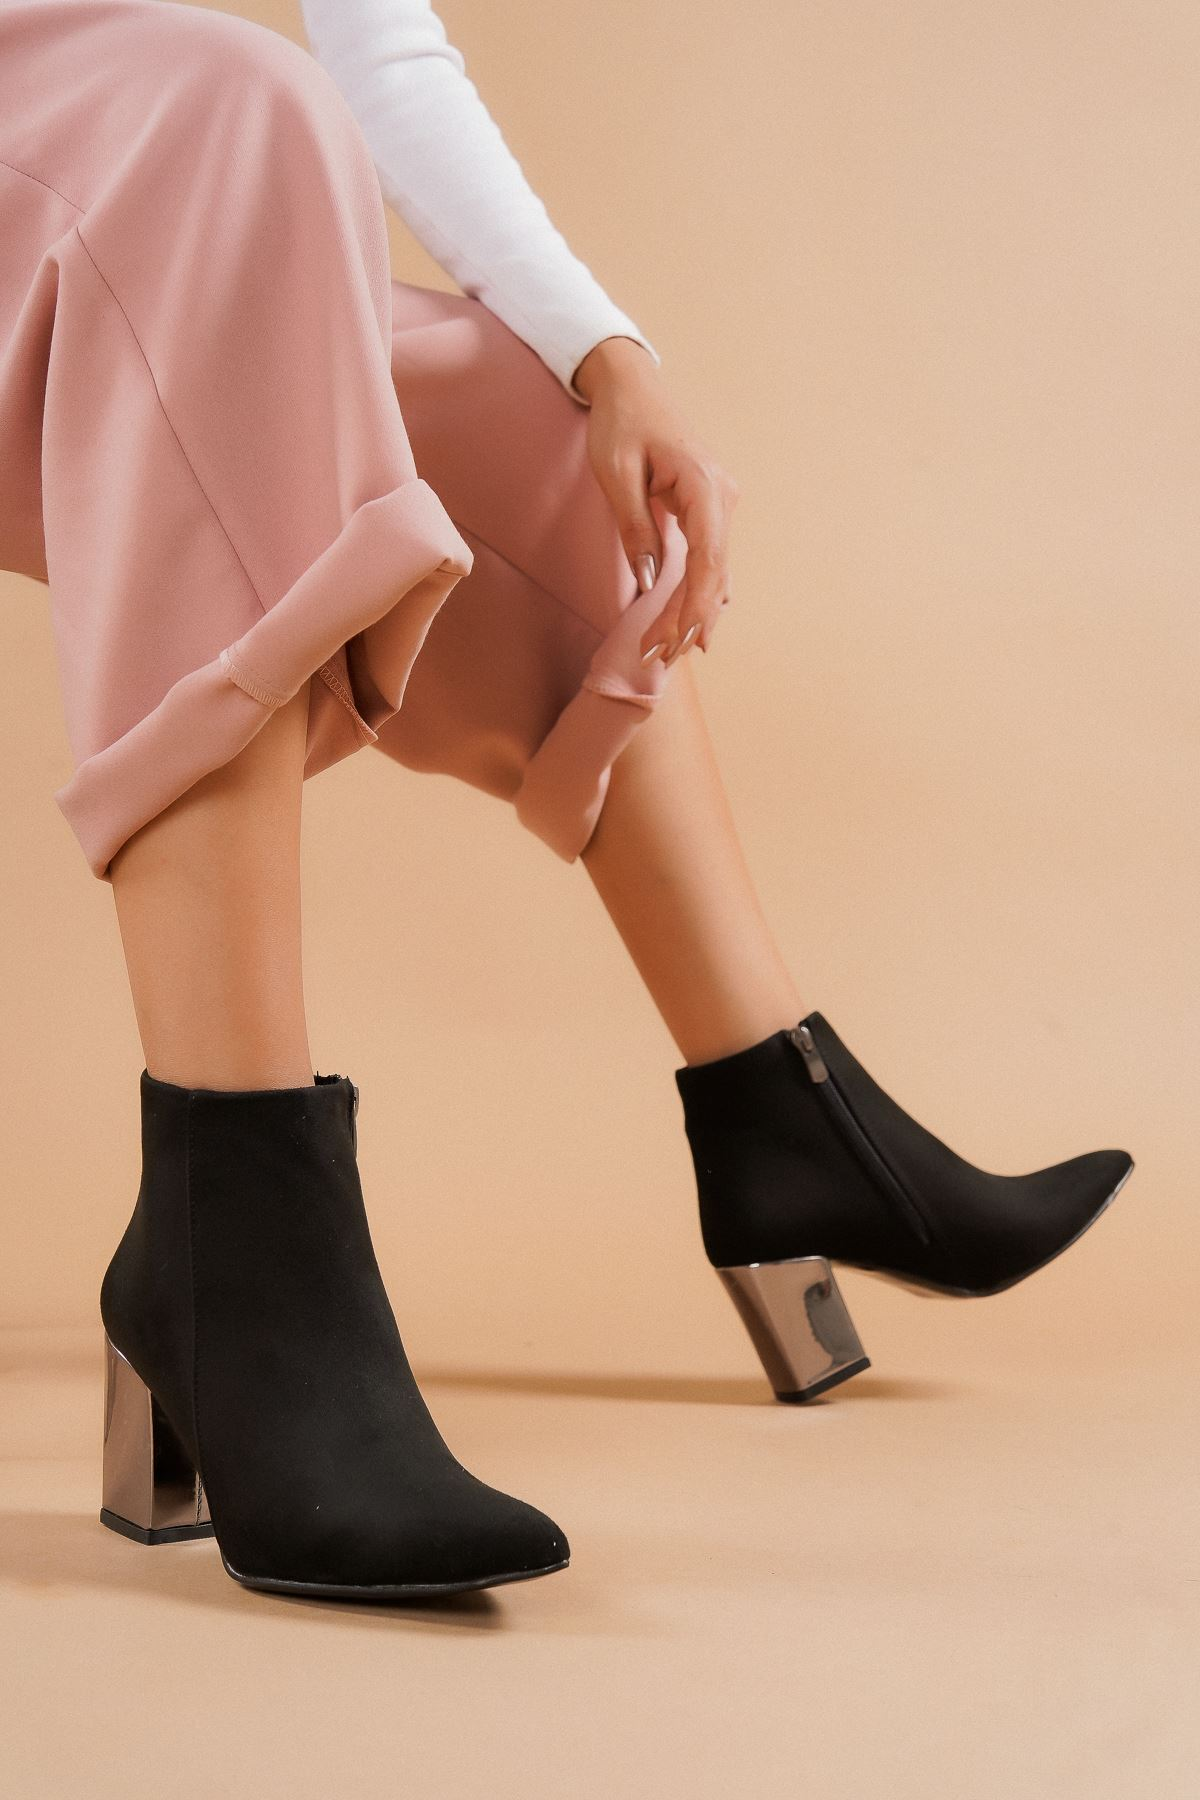 Shank Siyah Süet Platin Topuklu Kadın Bot